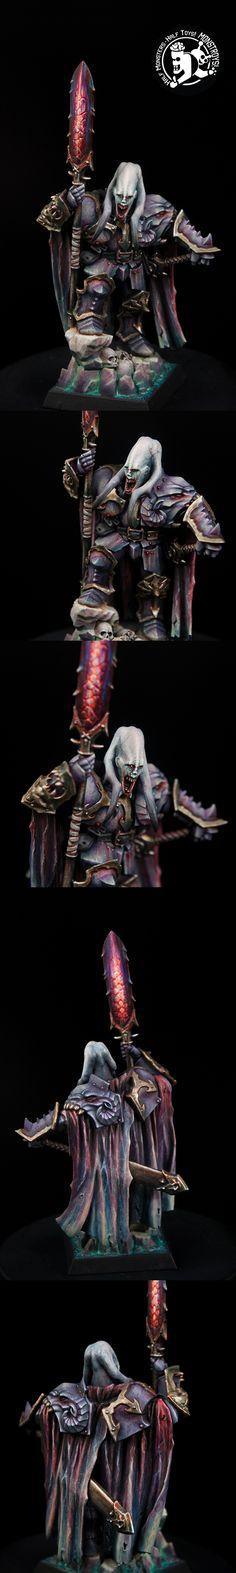 Chaos Lord of Slaanesh